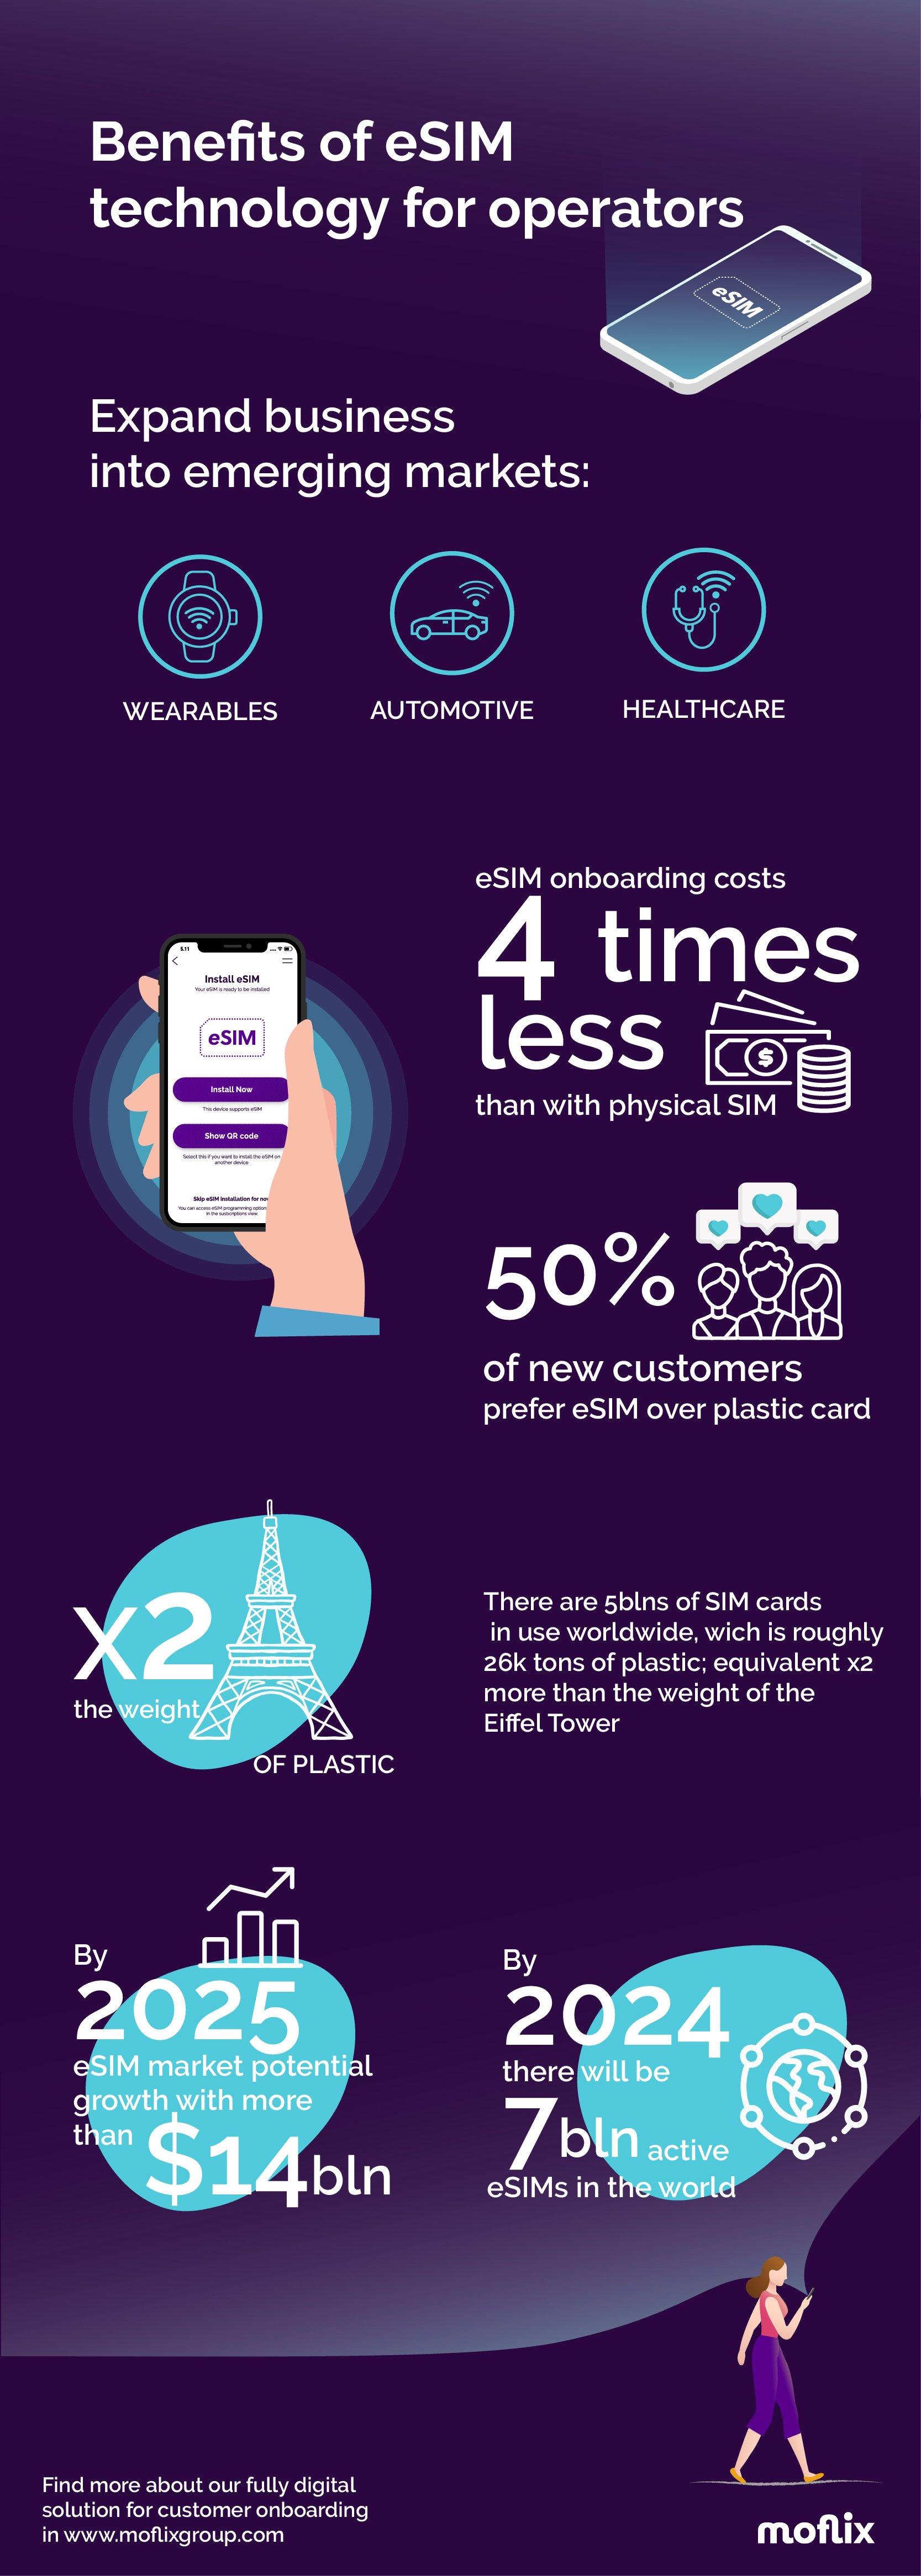 esim-benefits-infographic